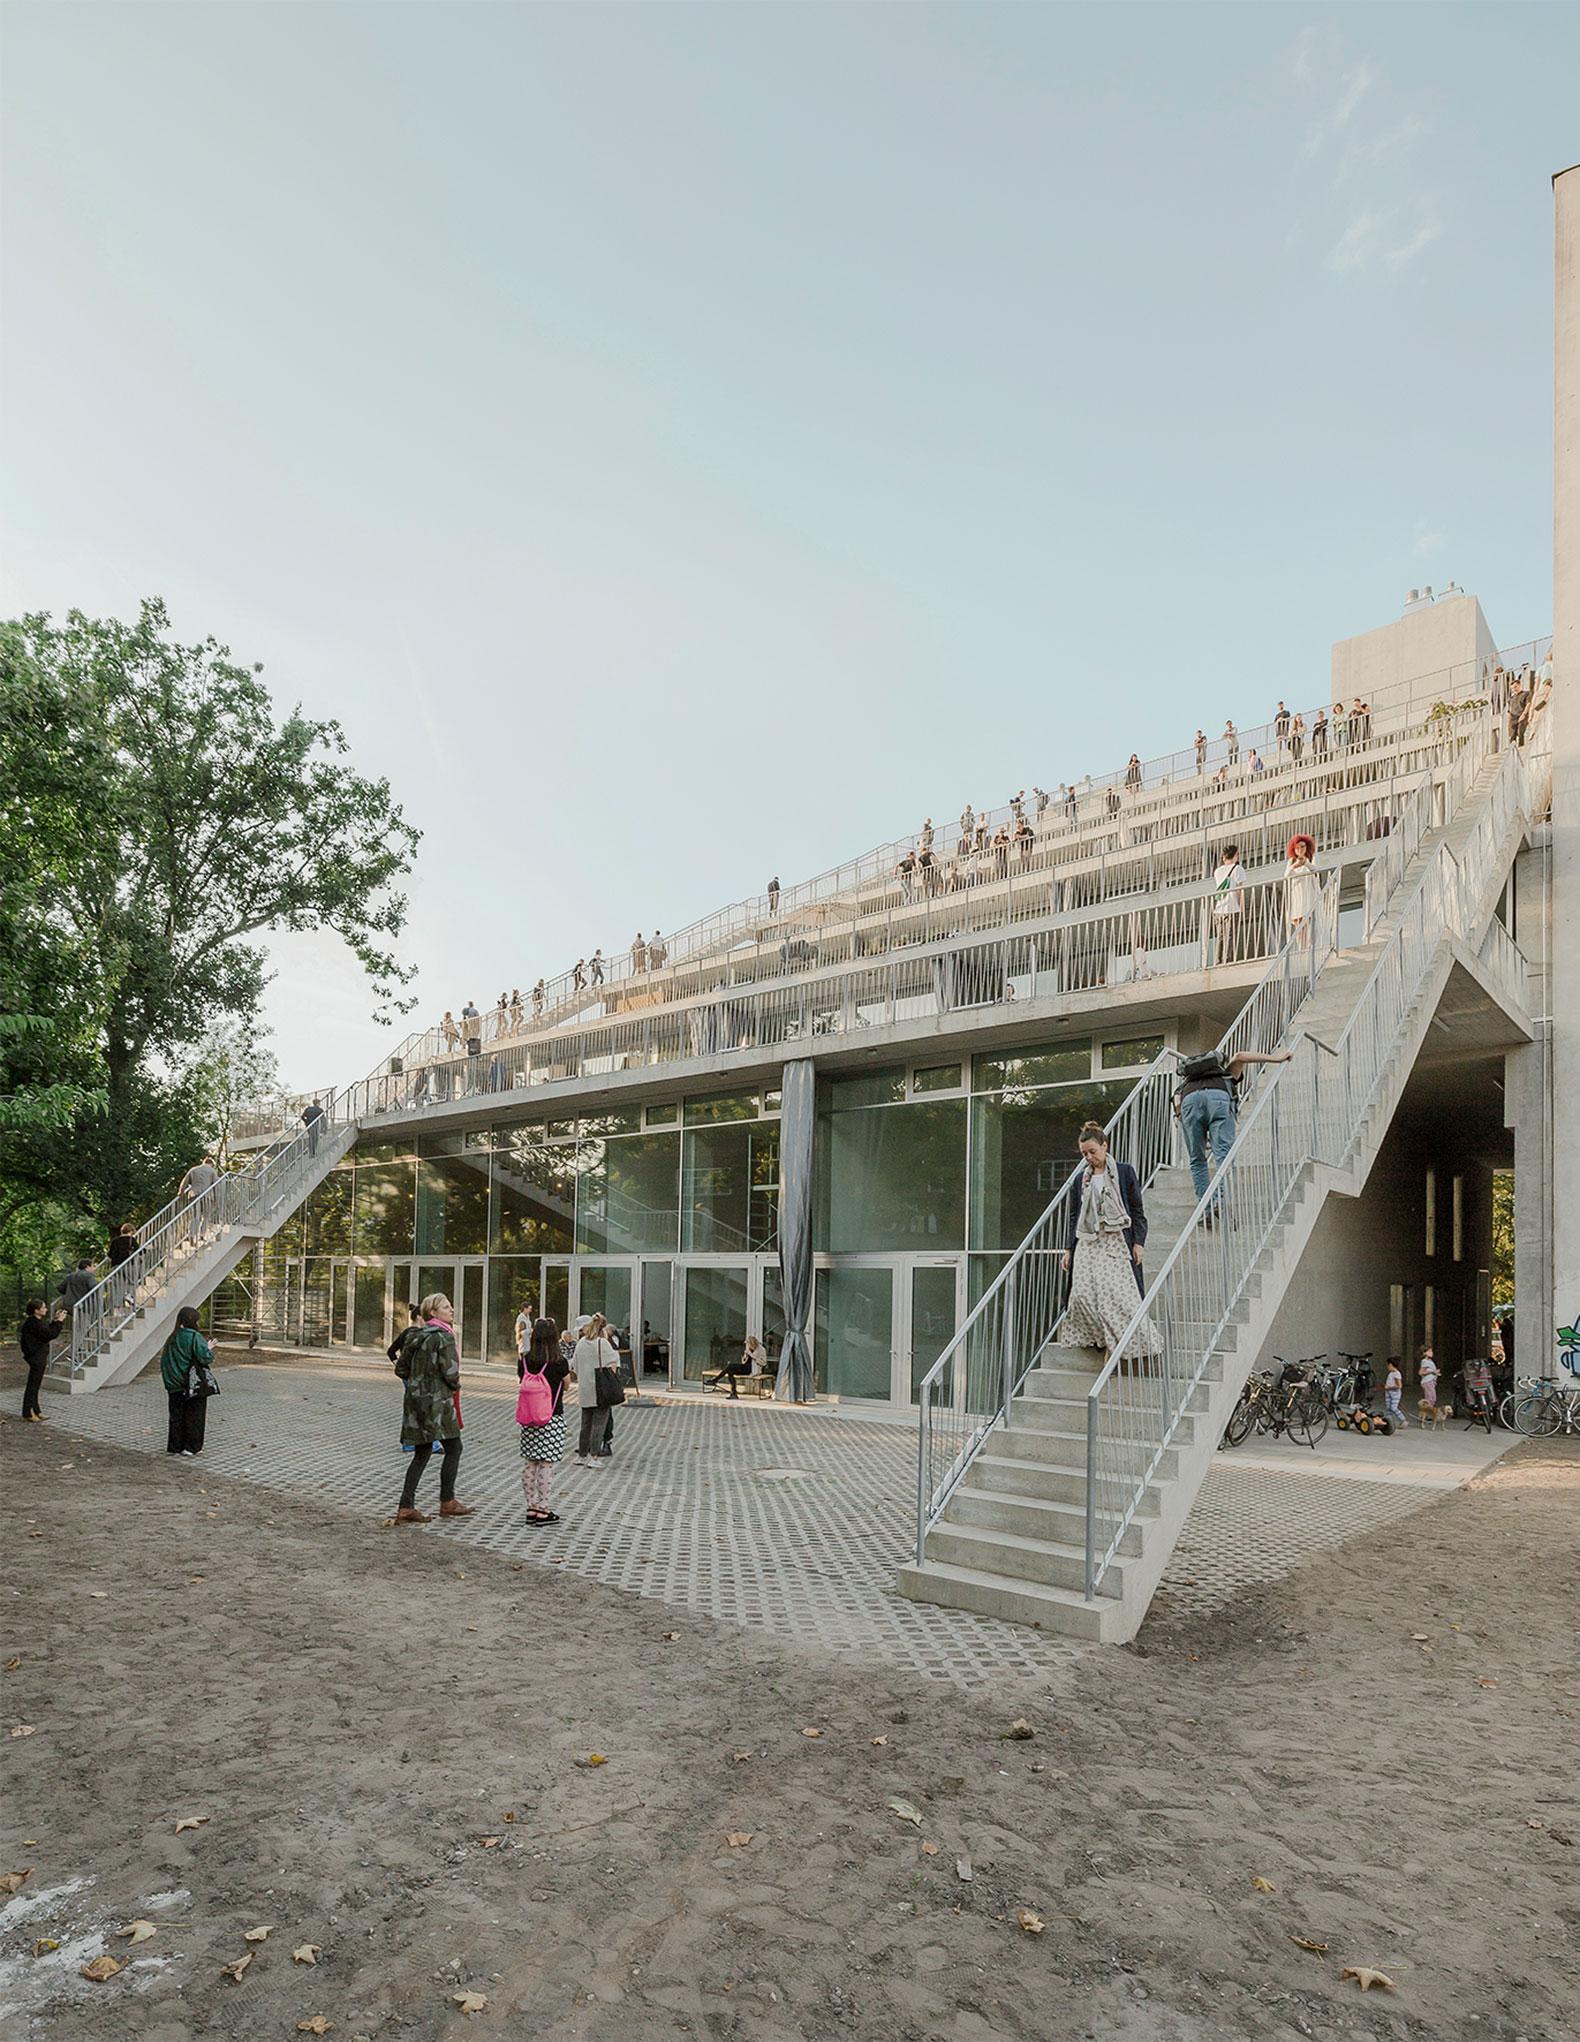 Terrassenhaus Berlín por Brandlhuber + Emde, Burlon + Muck Petzet. Fotografía por Erica Overmeer